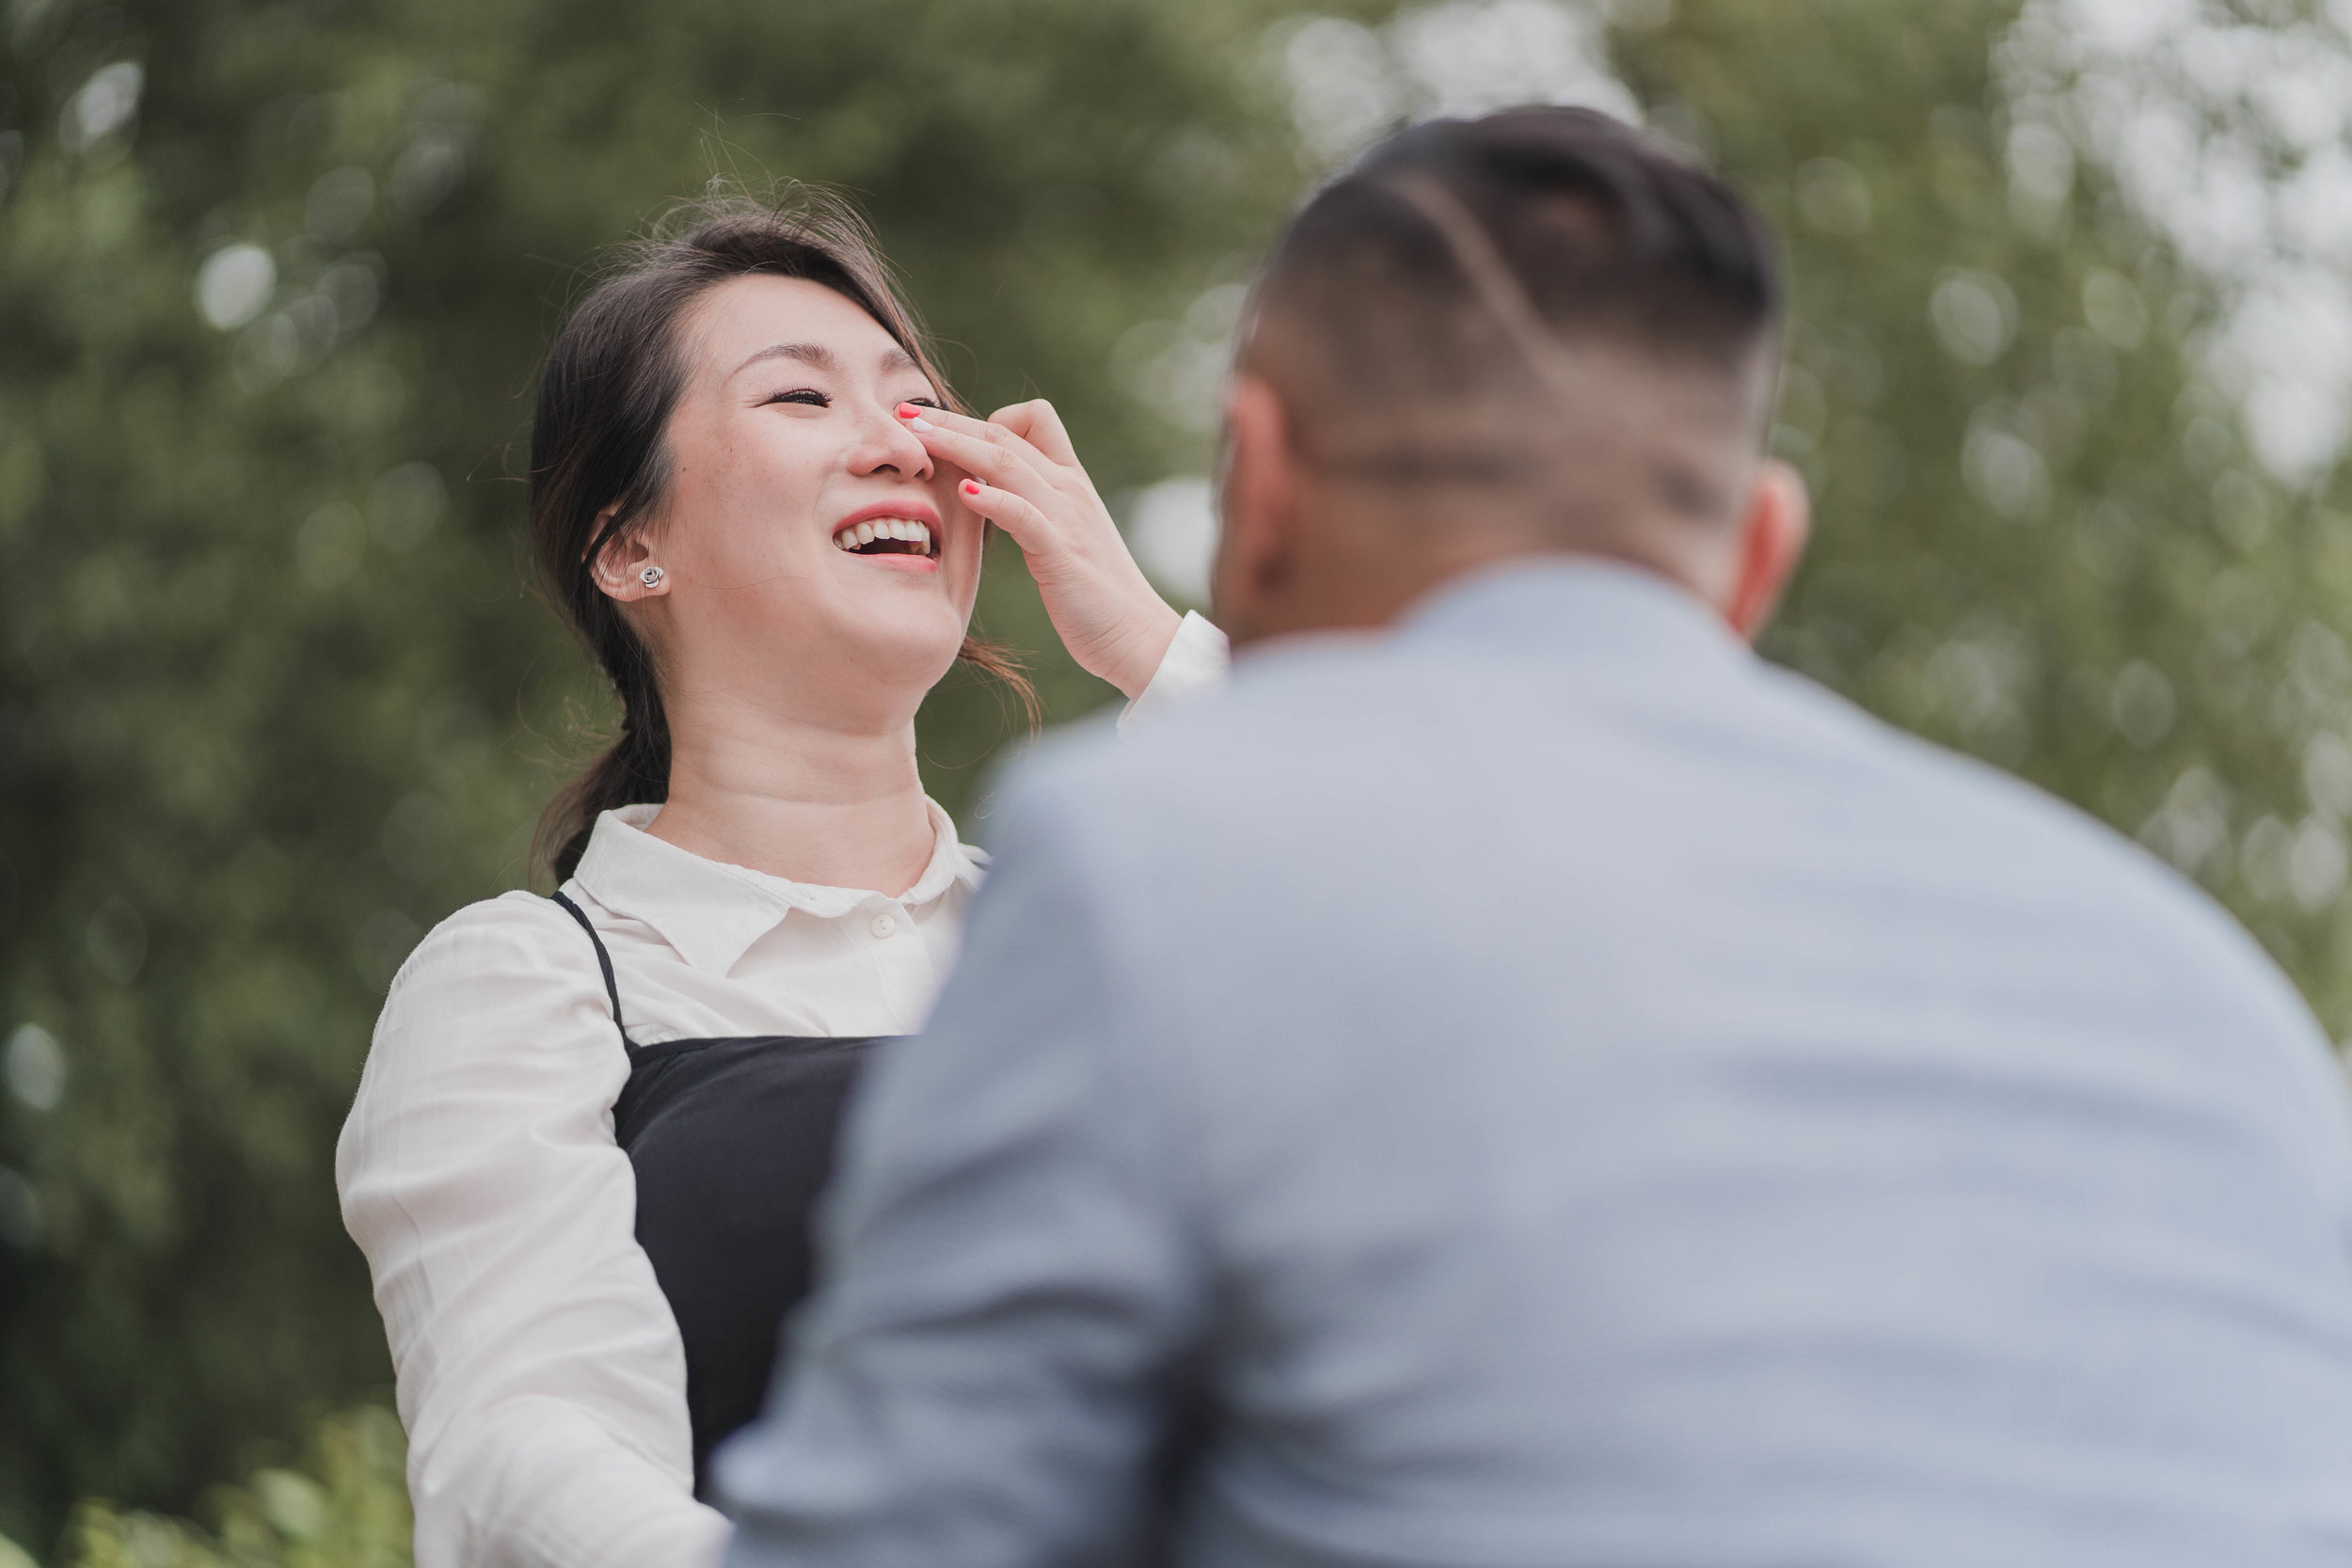 20190622 - Monika & Johnson Engagement - 0144.jpg